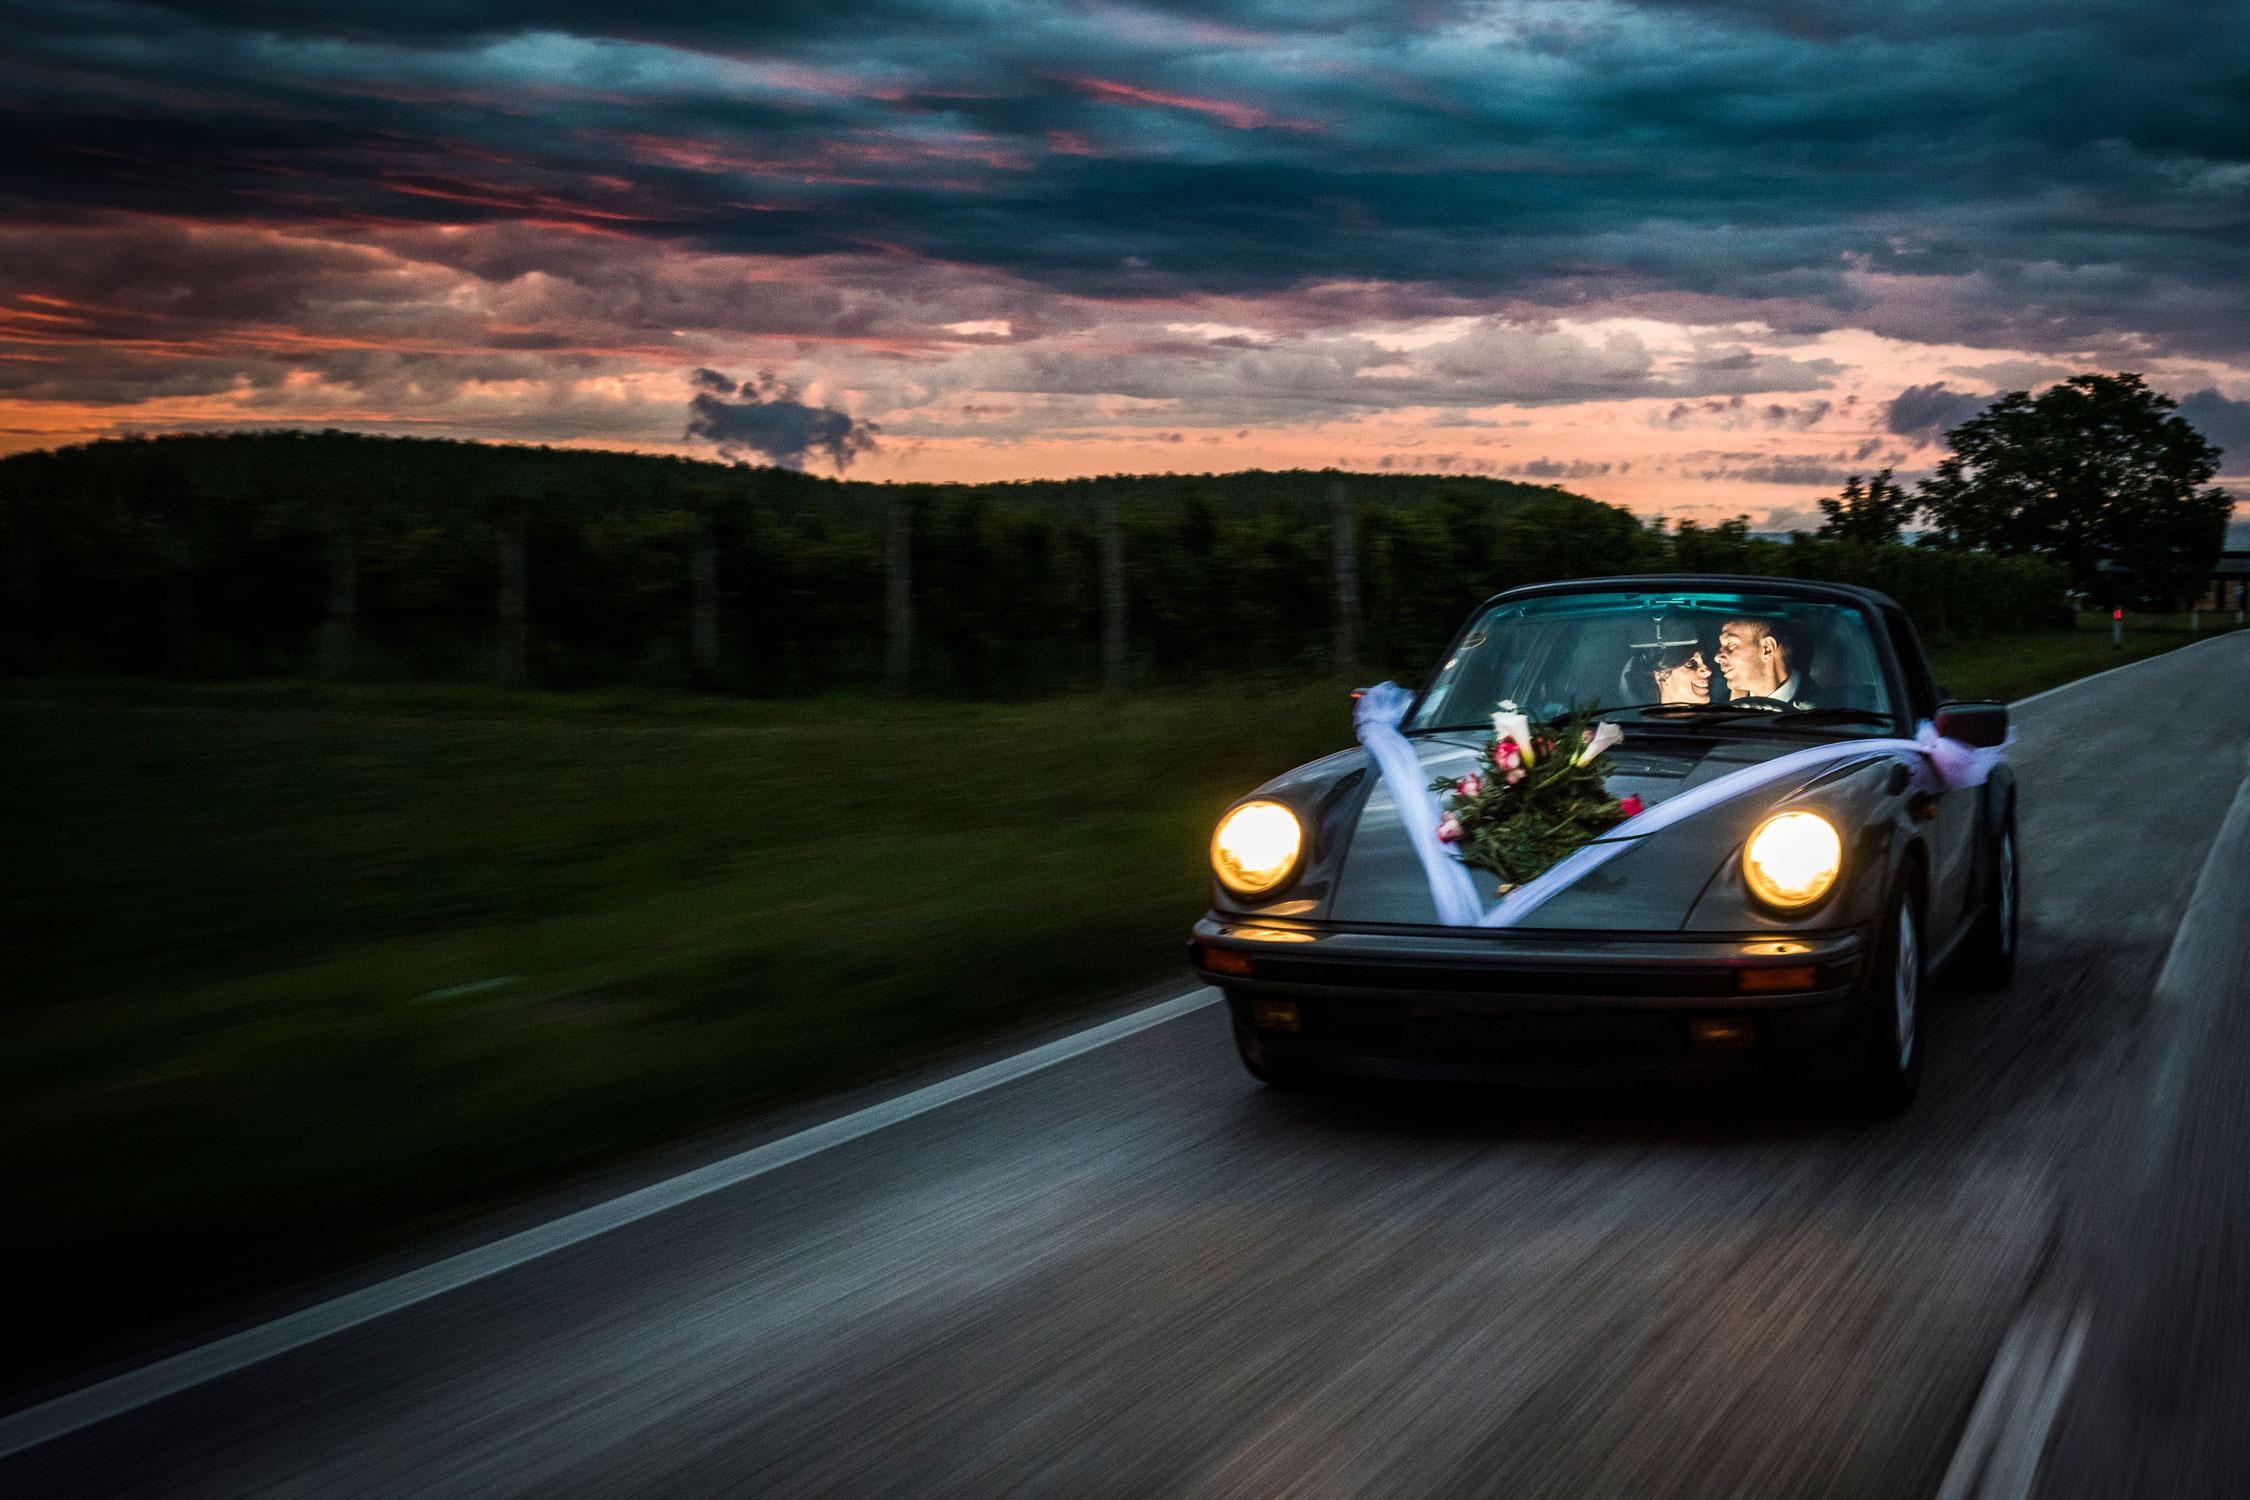 stefano-lunardi-fotografo_matrimoni_Italia_porsche_sunset_ok